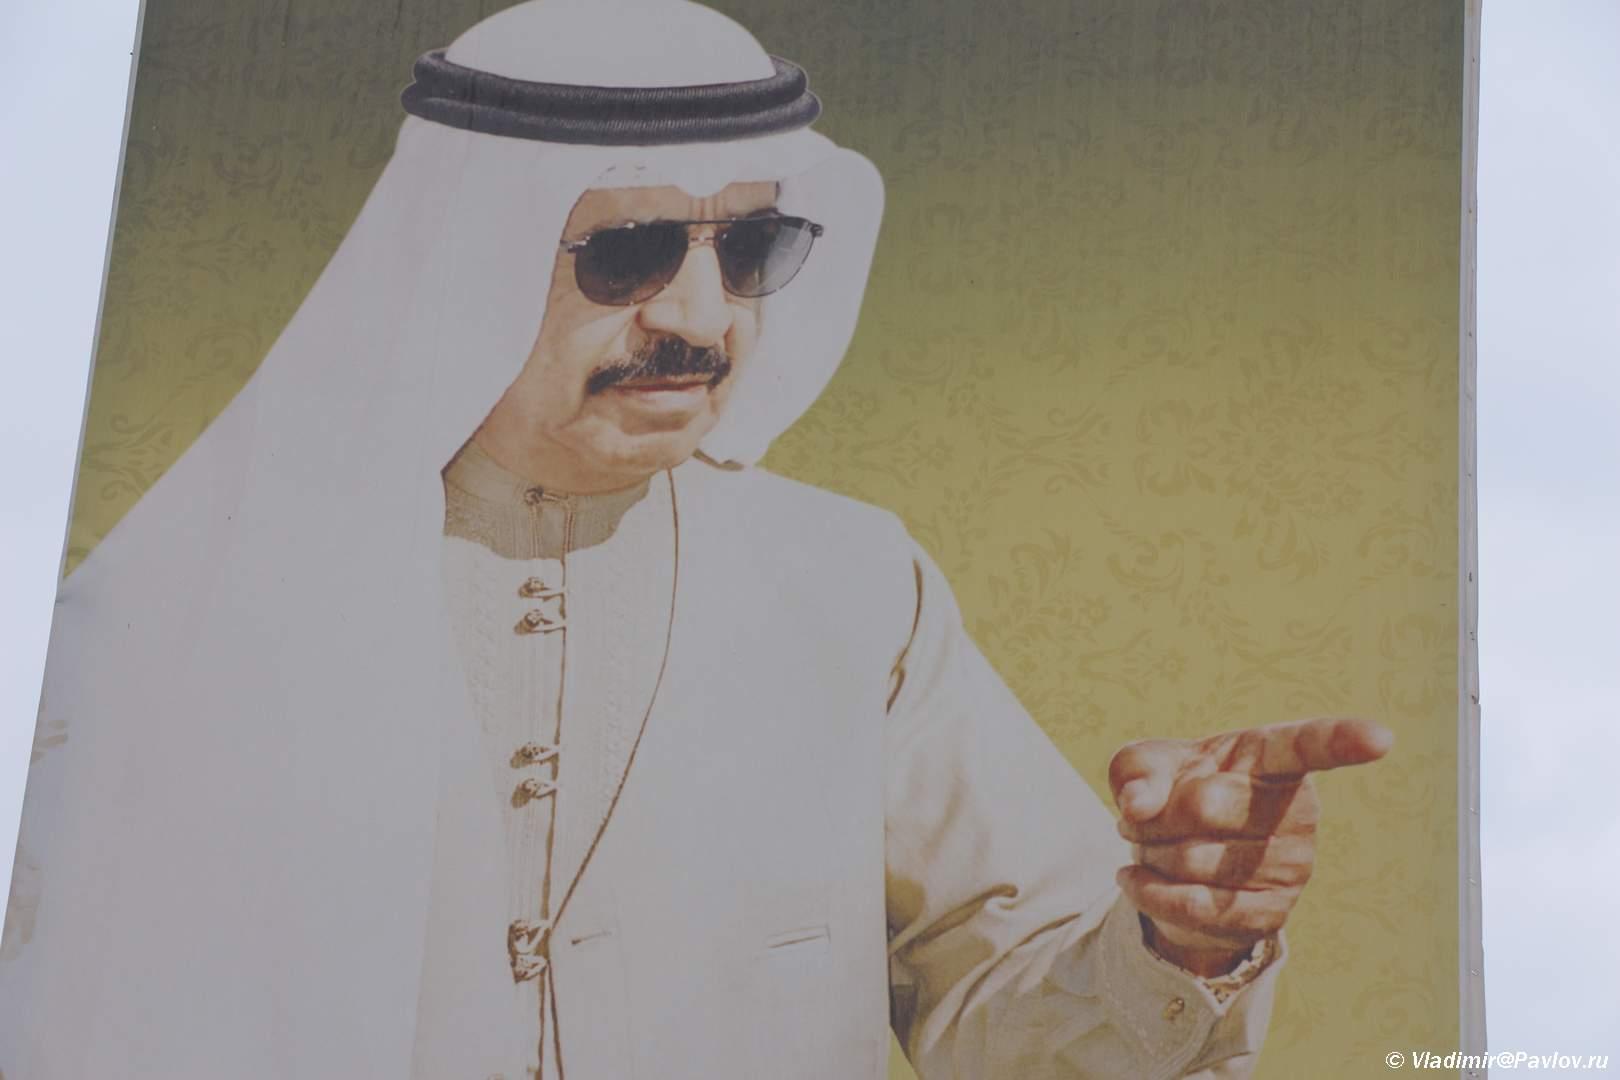 Premer ministr Bahrejna Halifa ibn Salman Al Halifa Khalifa bin Salman Al Khalifa. Bahrain prime minister - Бахрейн - остров и королевство